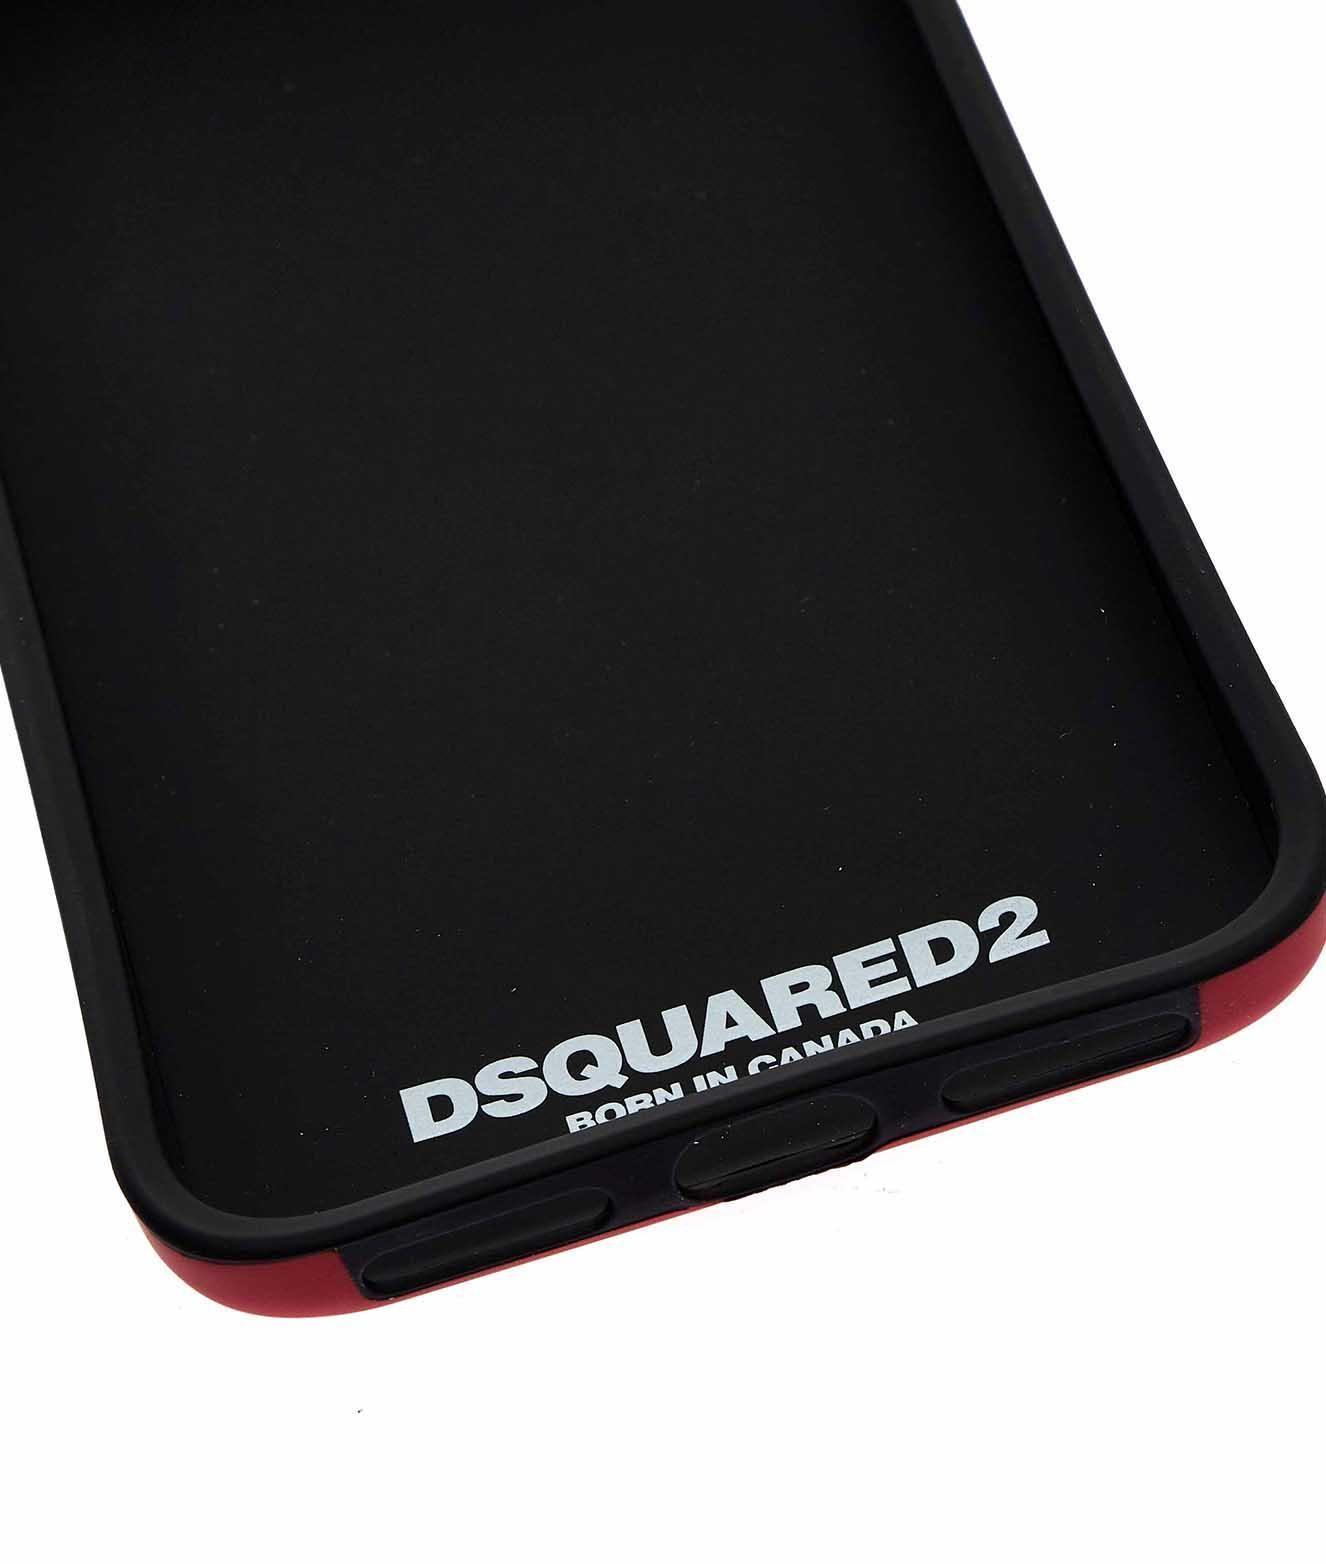 DSQUARED2 MEN'S ITM003855000001M818 RED PVC COVER